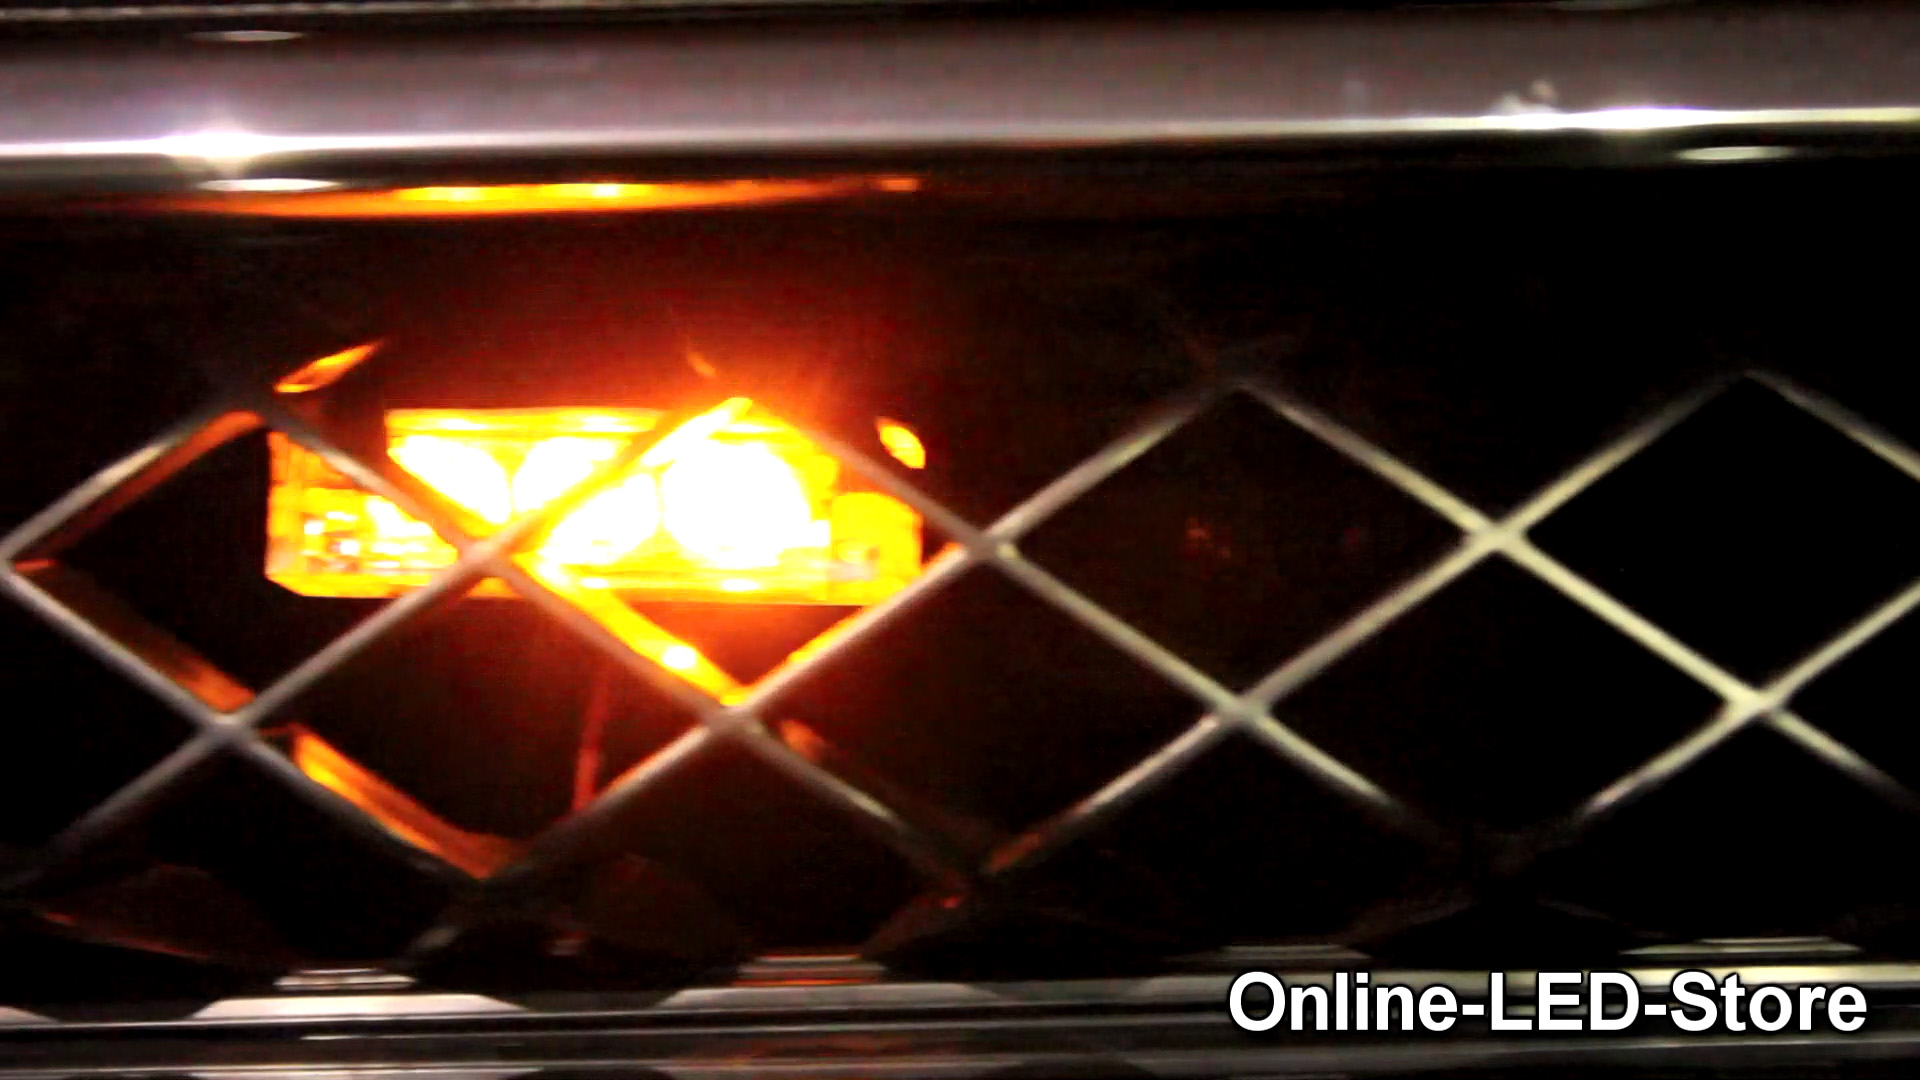 b36c4da87271cec056b6e1a6b9a31c88ec7f5391?image_crop_resized=274x154 video gallery led vehicle lights online led store com online led store fuse box at bakdesigns.co